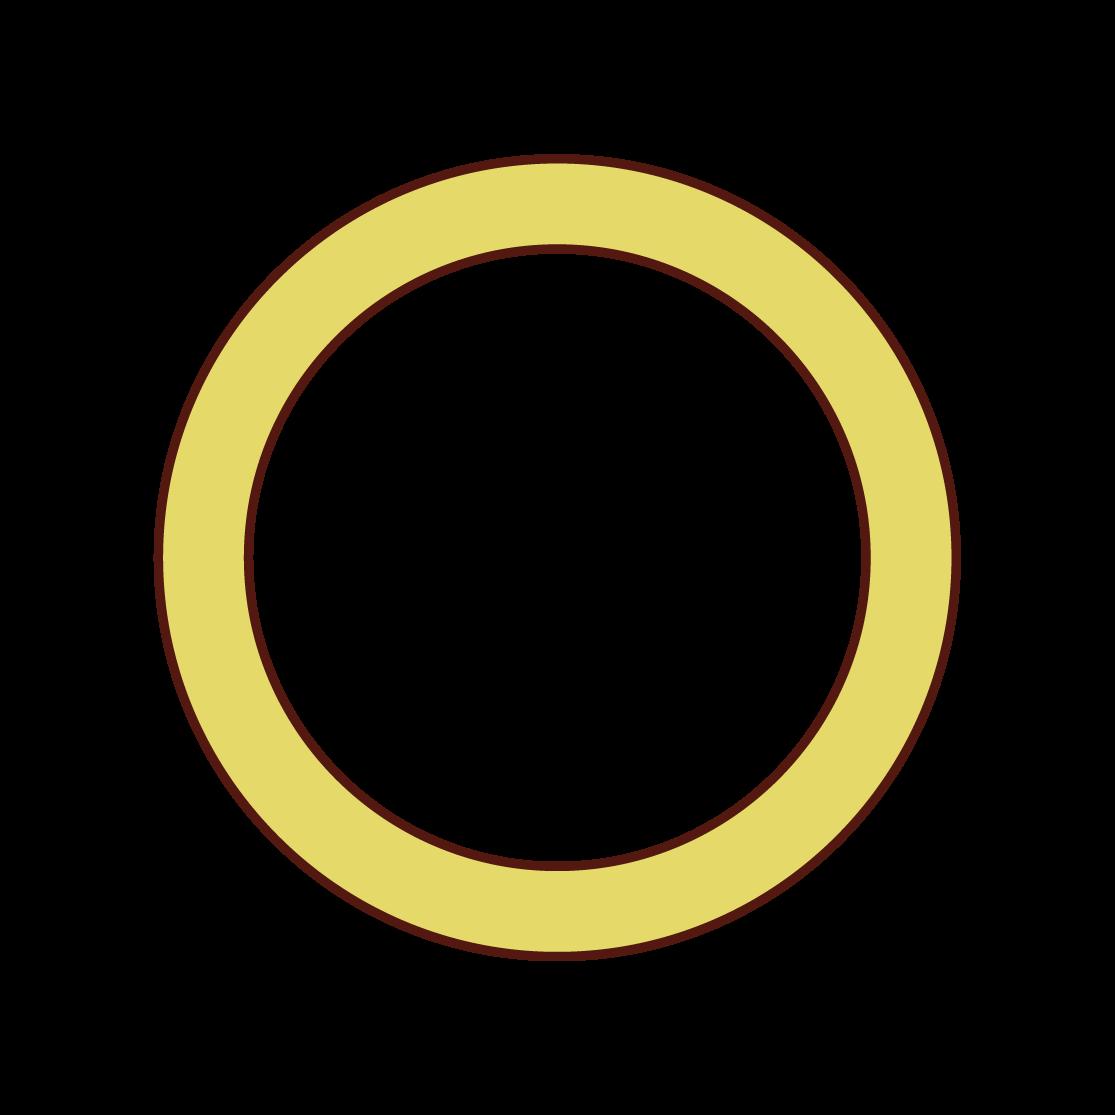 Illustration of a circle